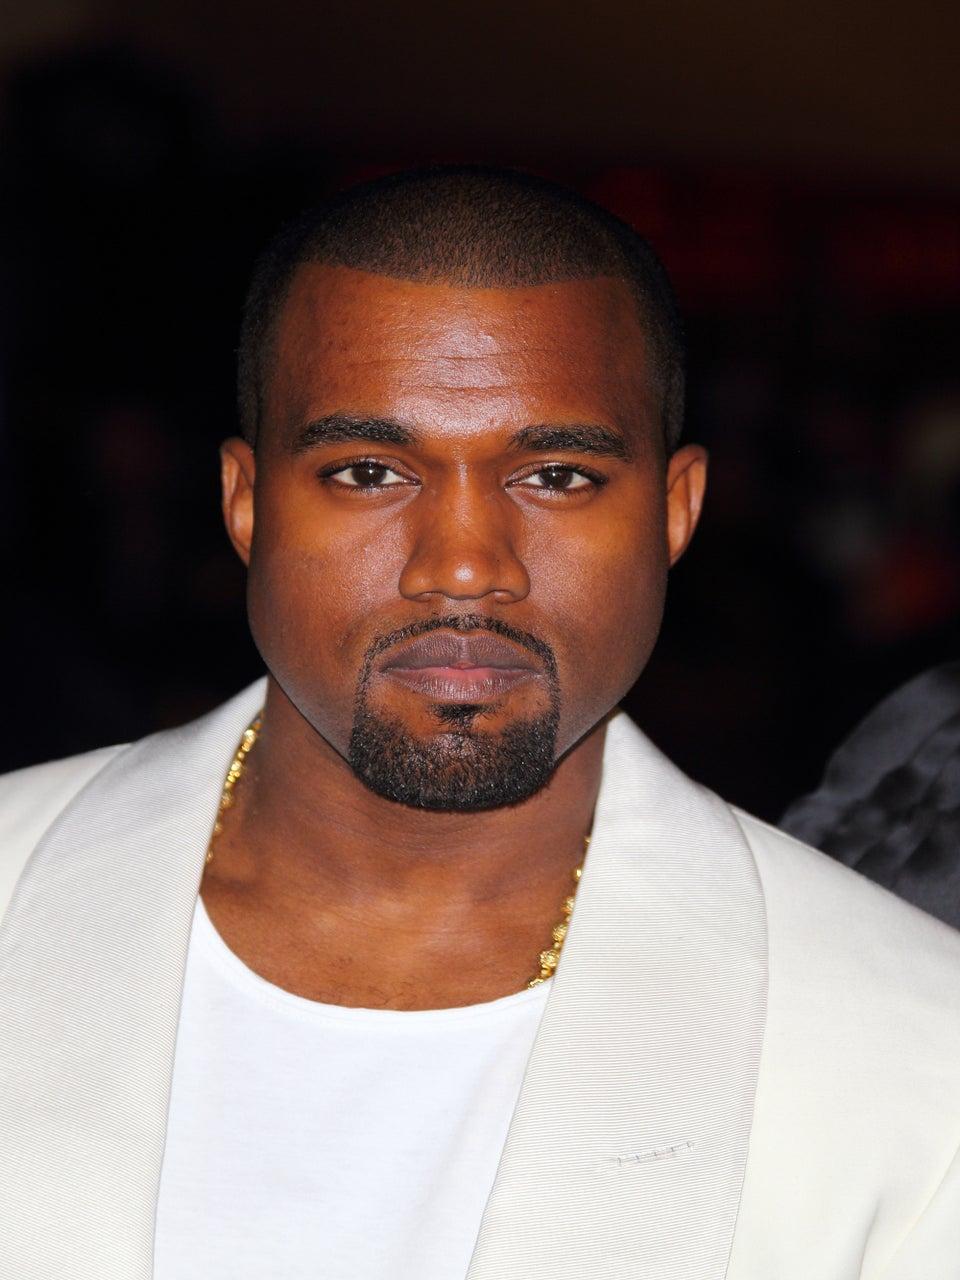 Kanye West Says 'I Make Perfect Music'